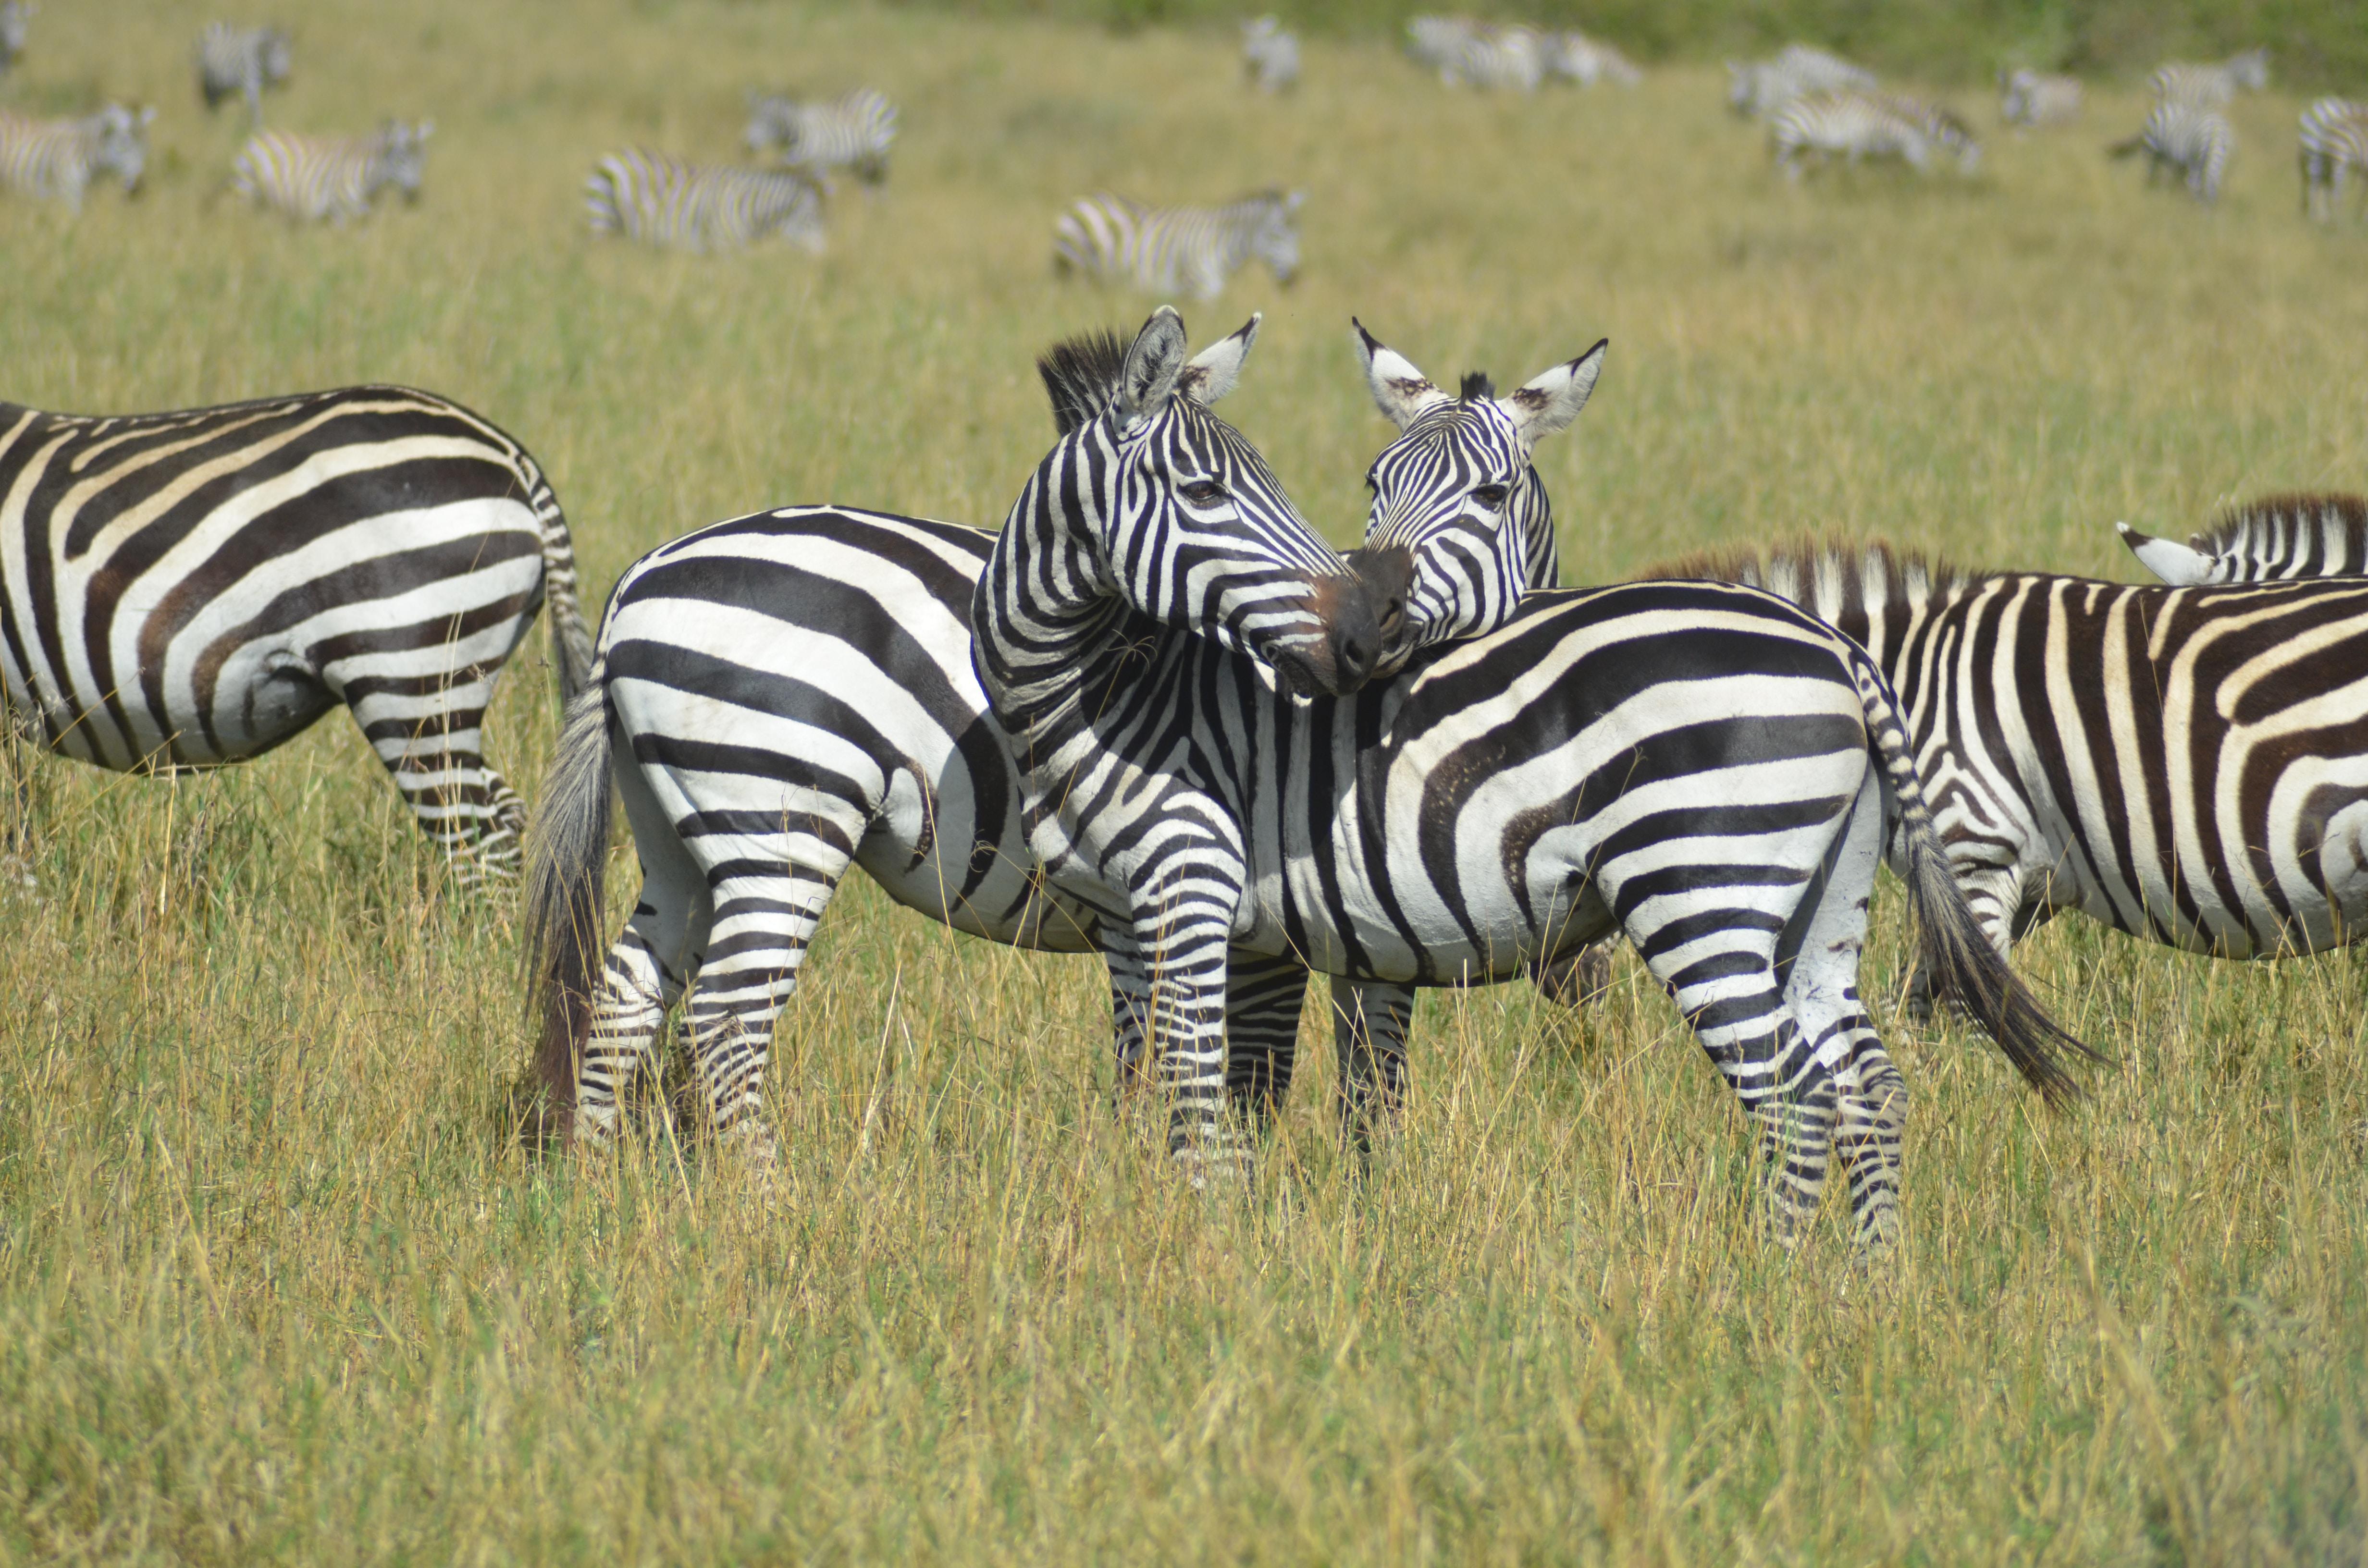 herd of zebra on green grass field during daytime